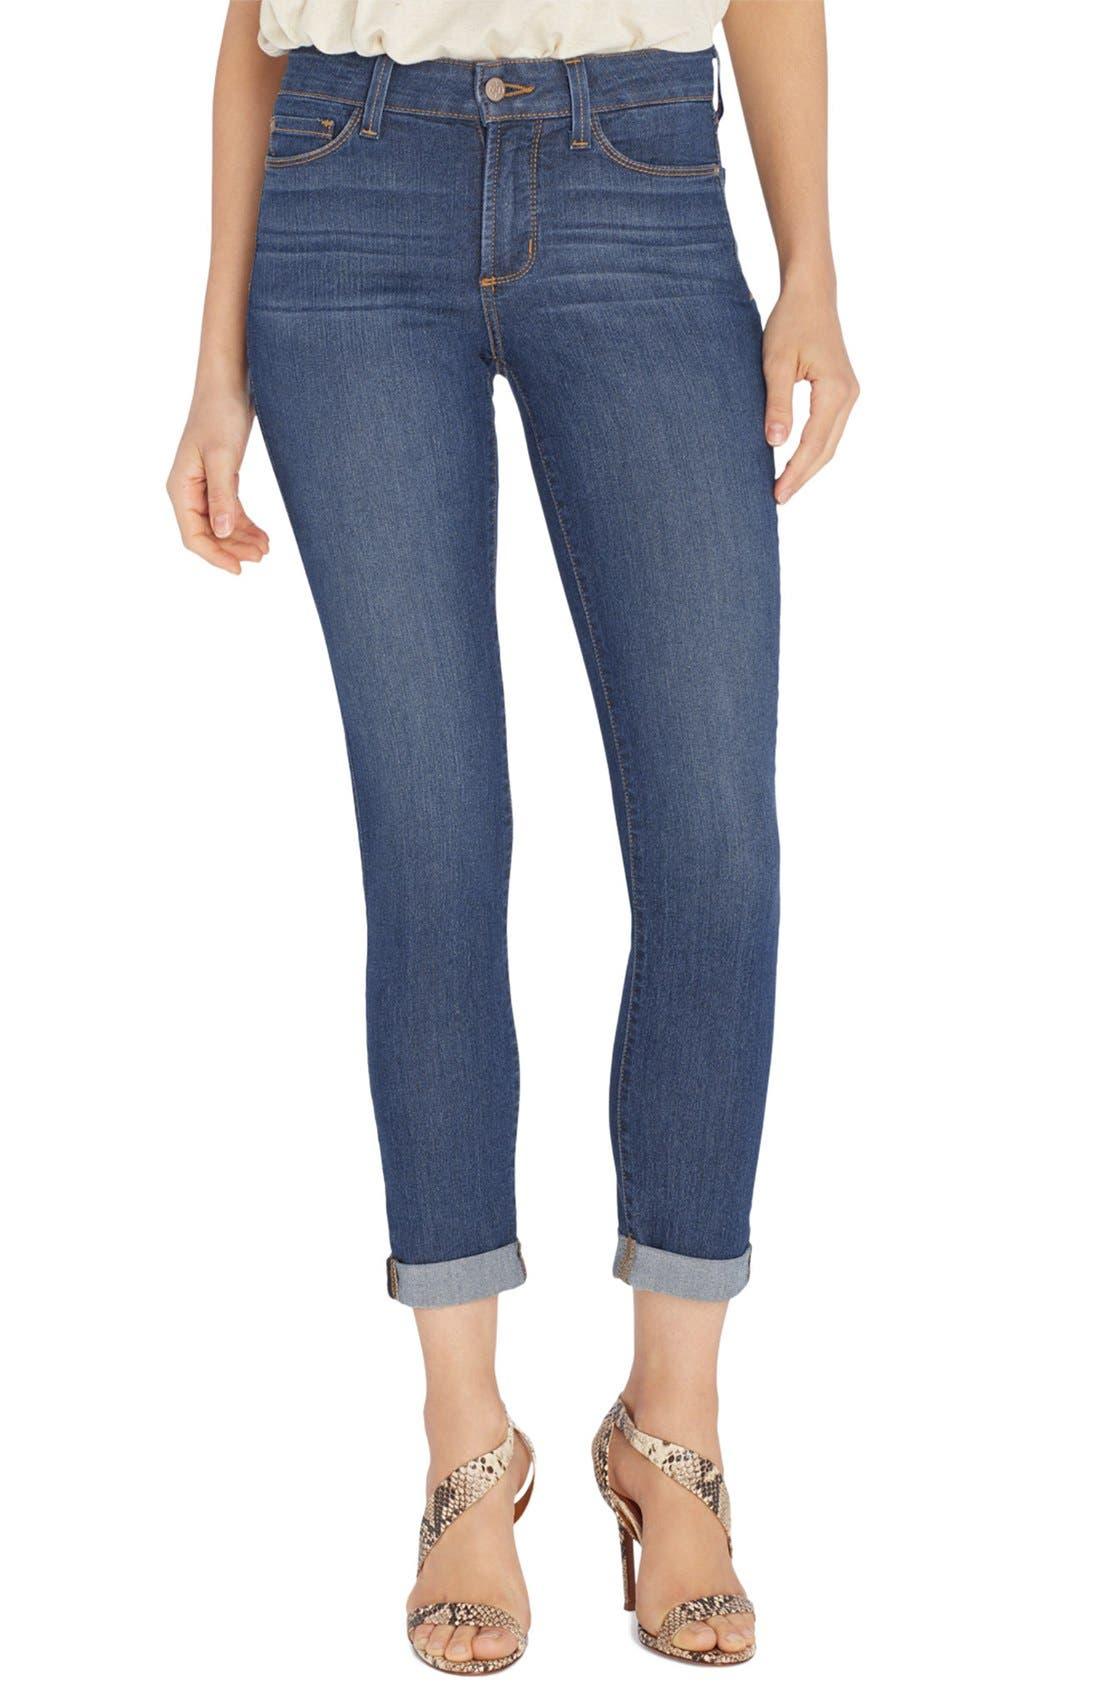 'Annabelle' Stretch Boyfriend Jeans,                             Main thumbnail 1, color,                             401